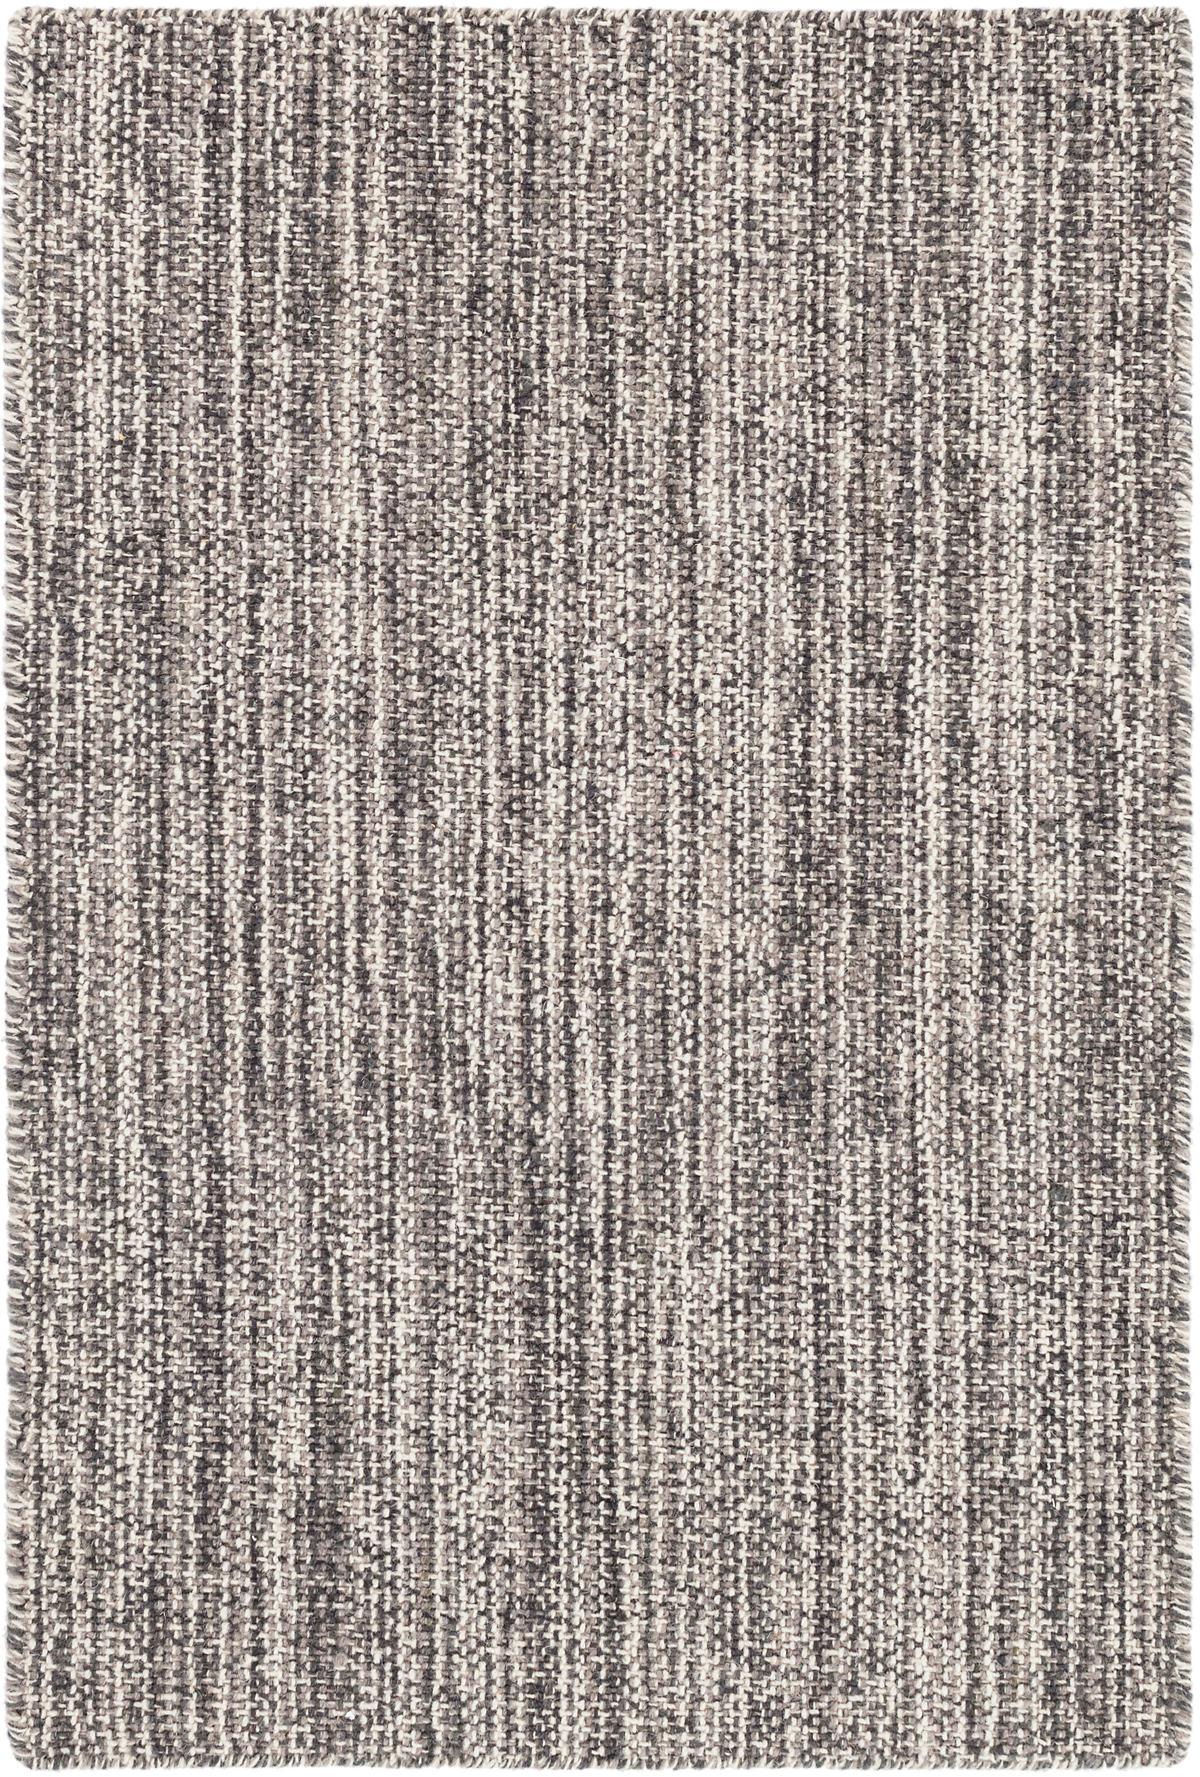 Bella Grey Woven Wool Rug